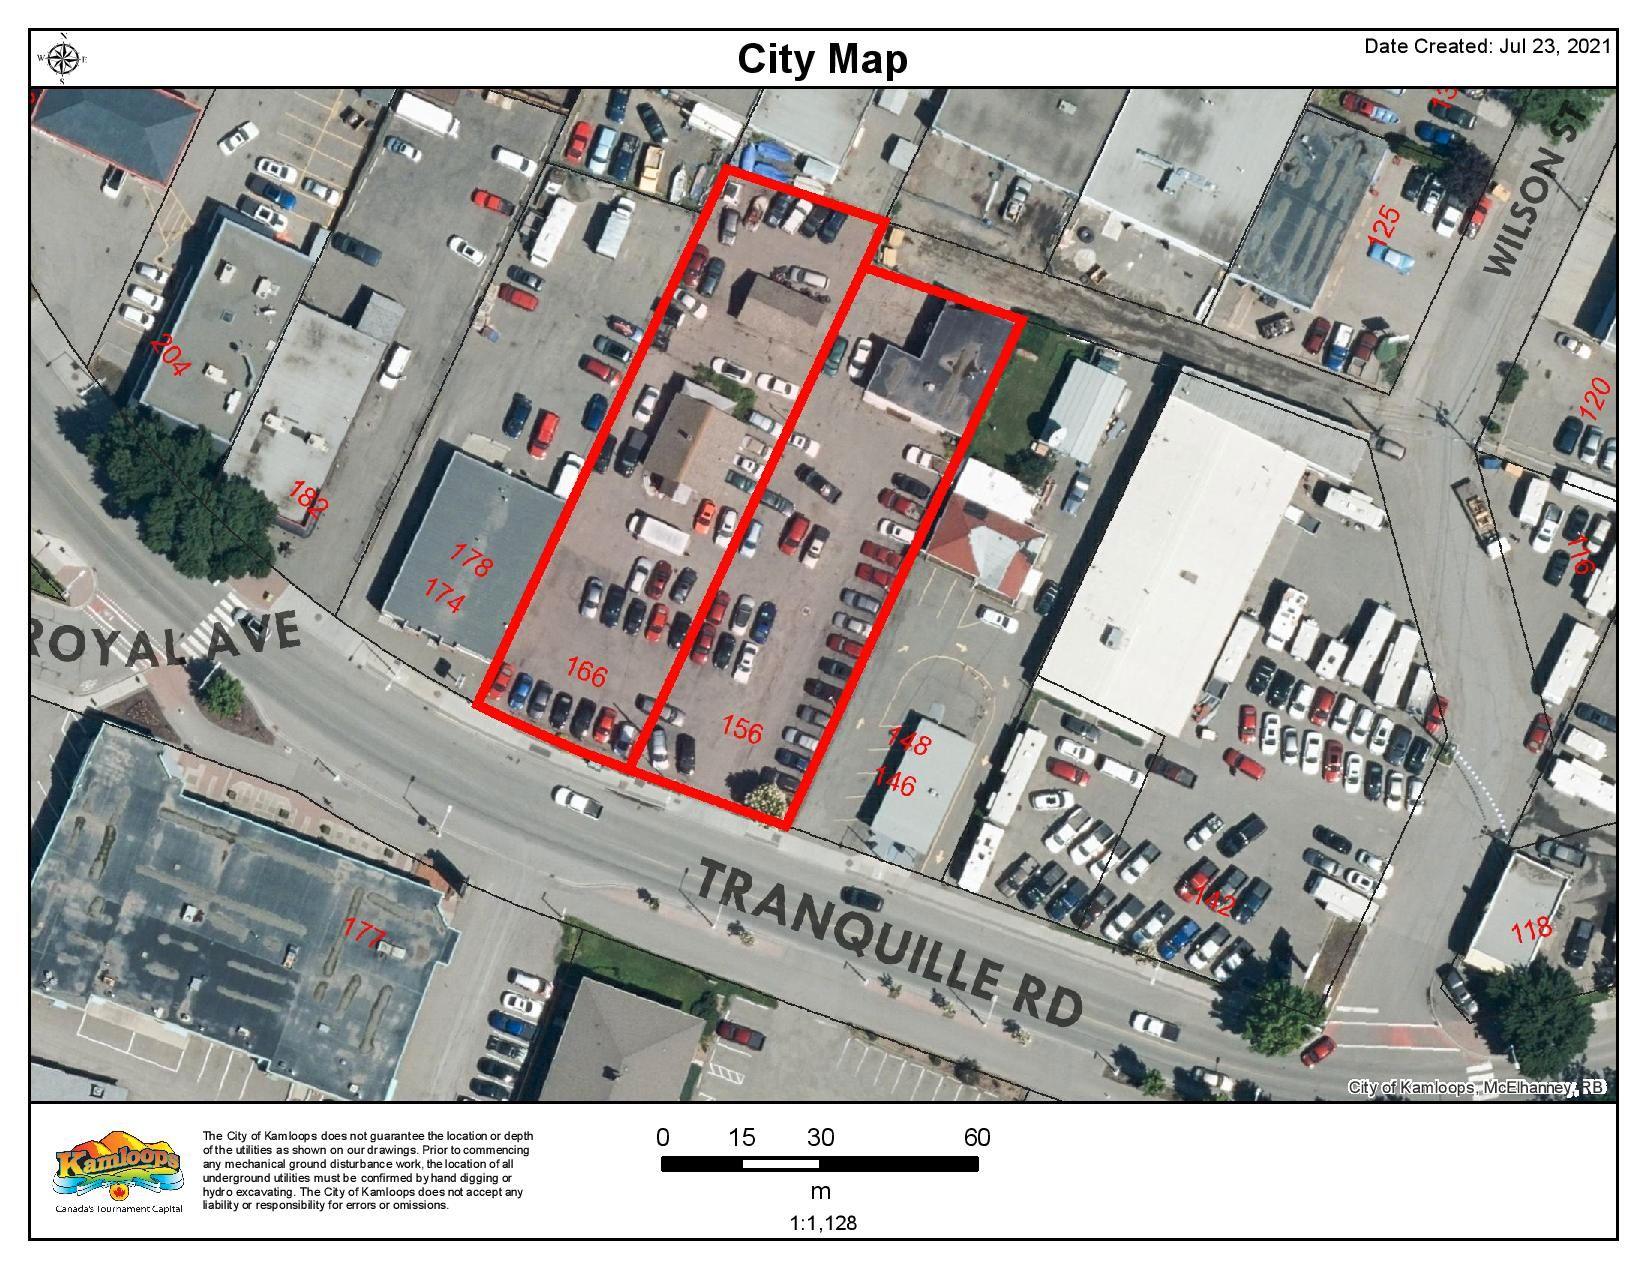 Main Photo: 156/166 TRANQUILLE ROAD in KAMLOOPS: NORTH KAMLOOPS Commercial for sale : MLS®# 163345